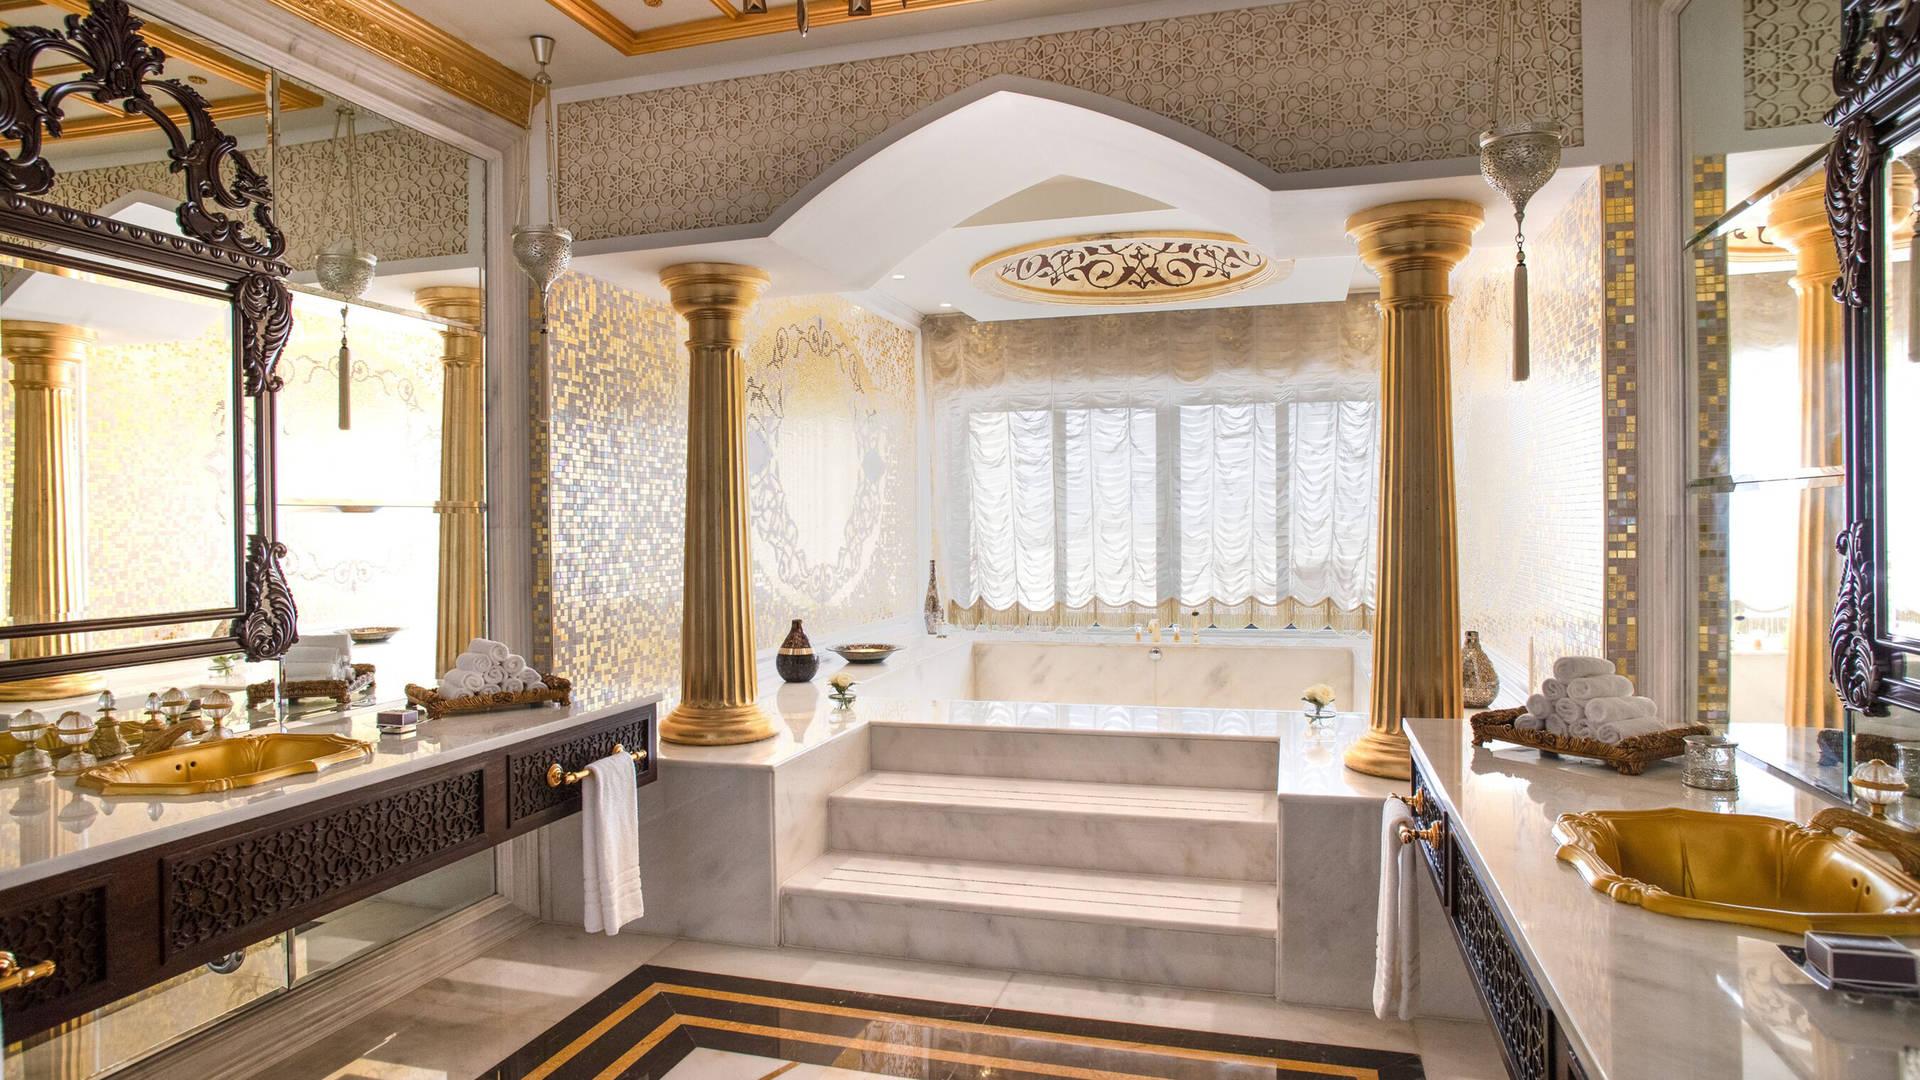 Jumeirah Zabeel Saray Grand Imperial Suite Bathroom Area